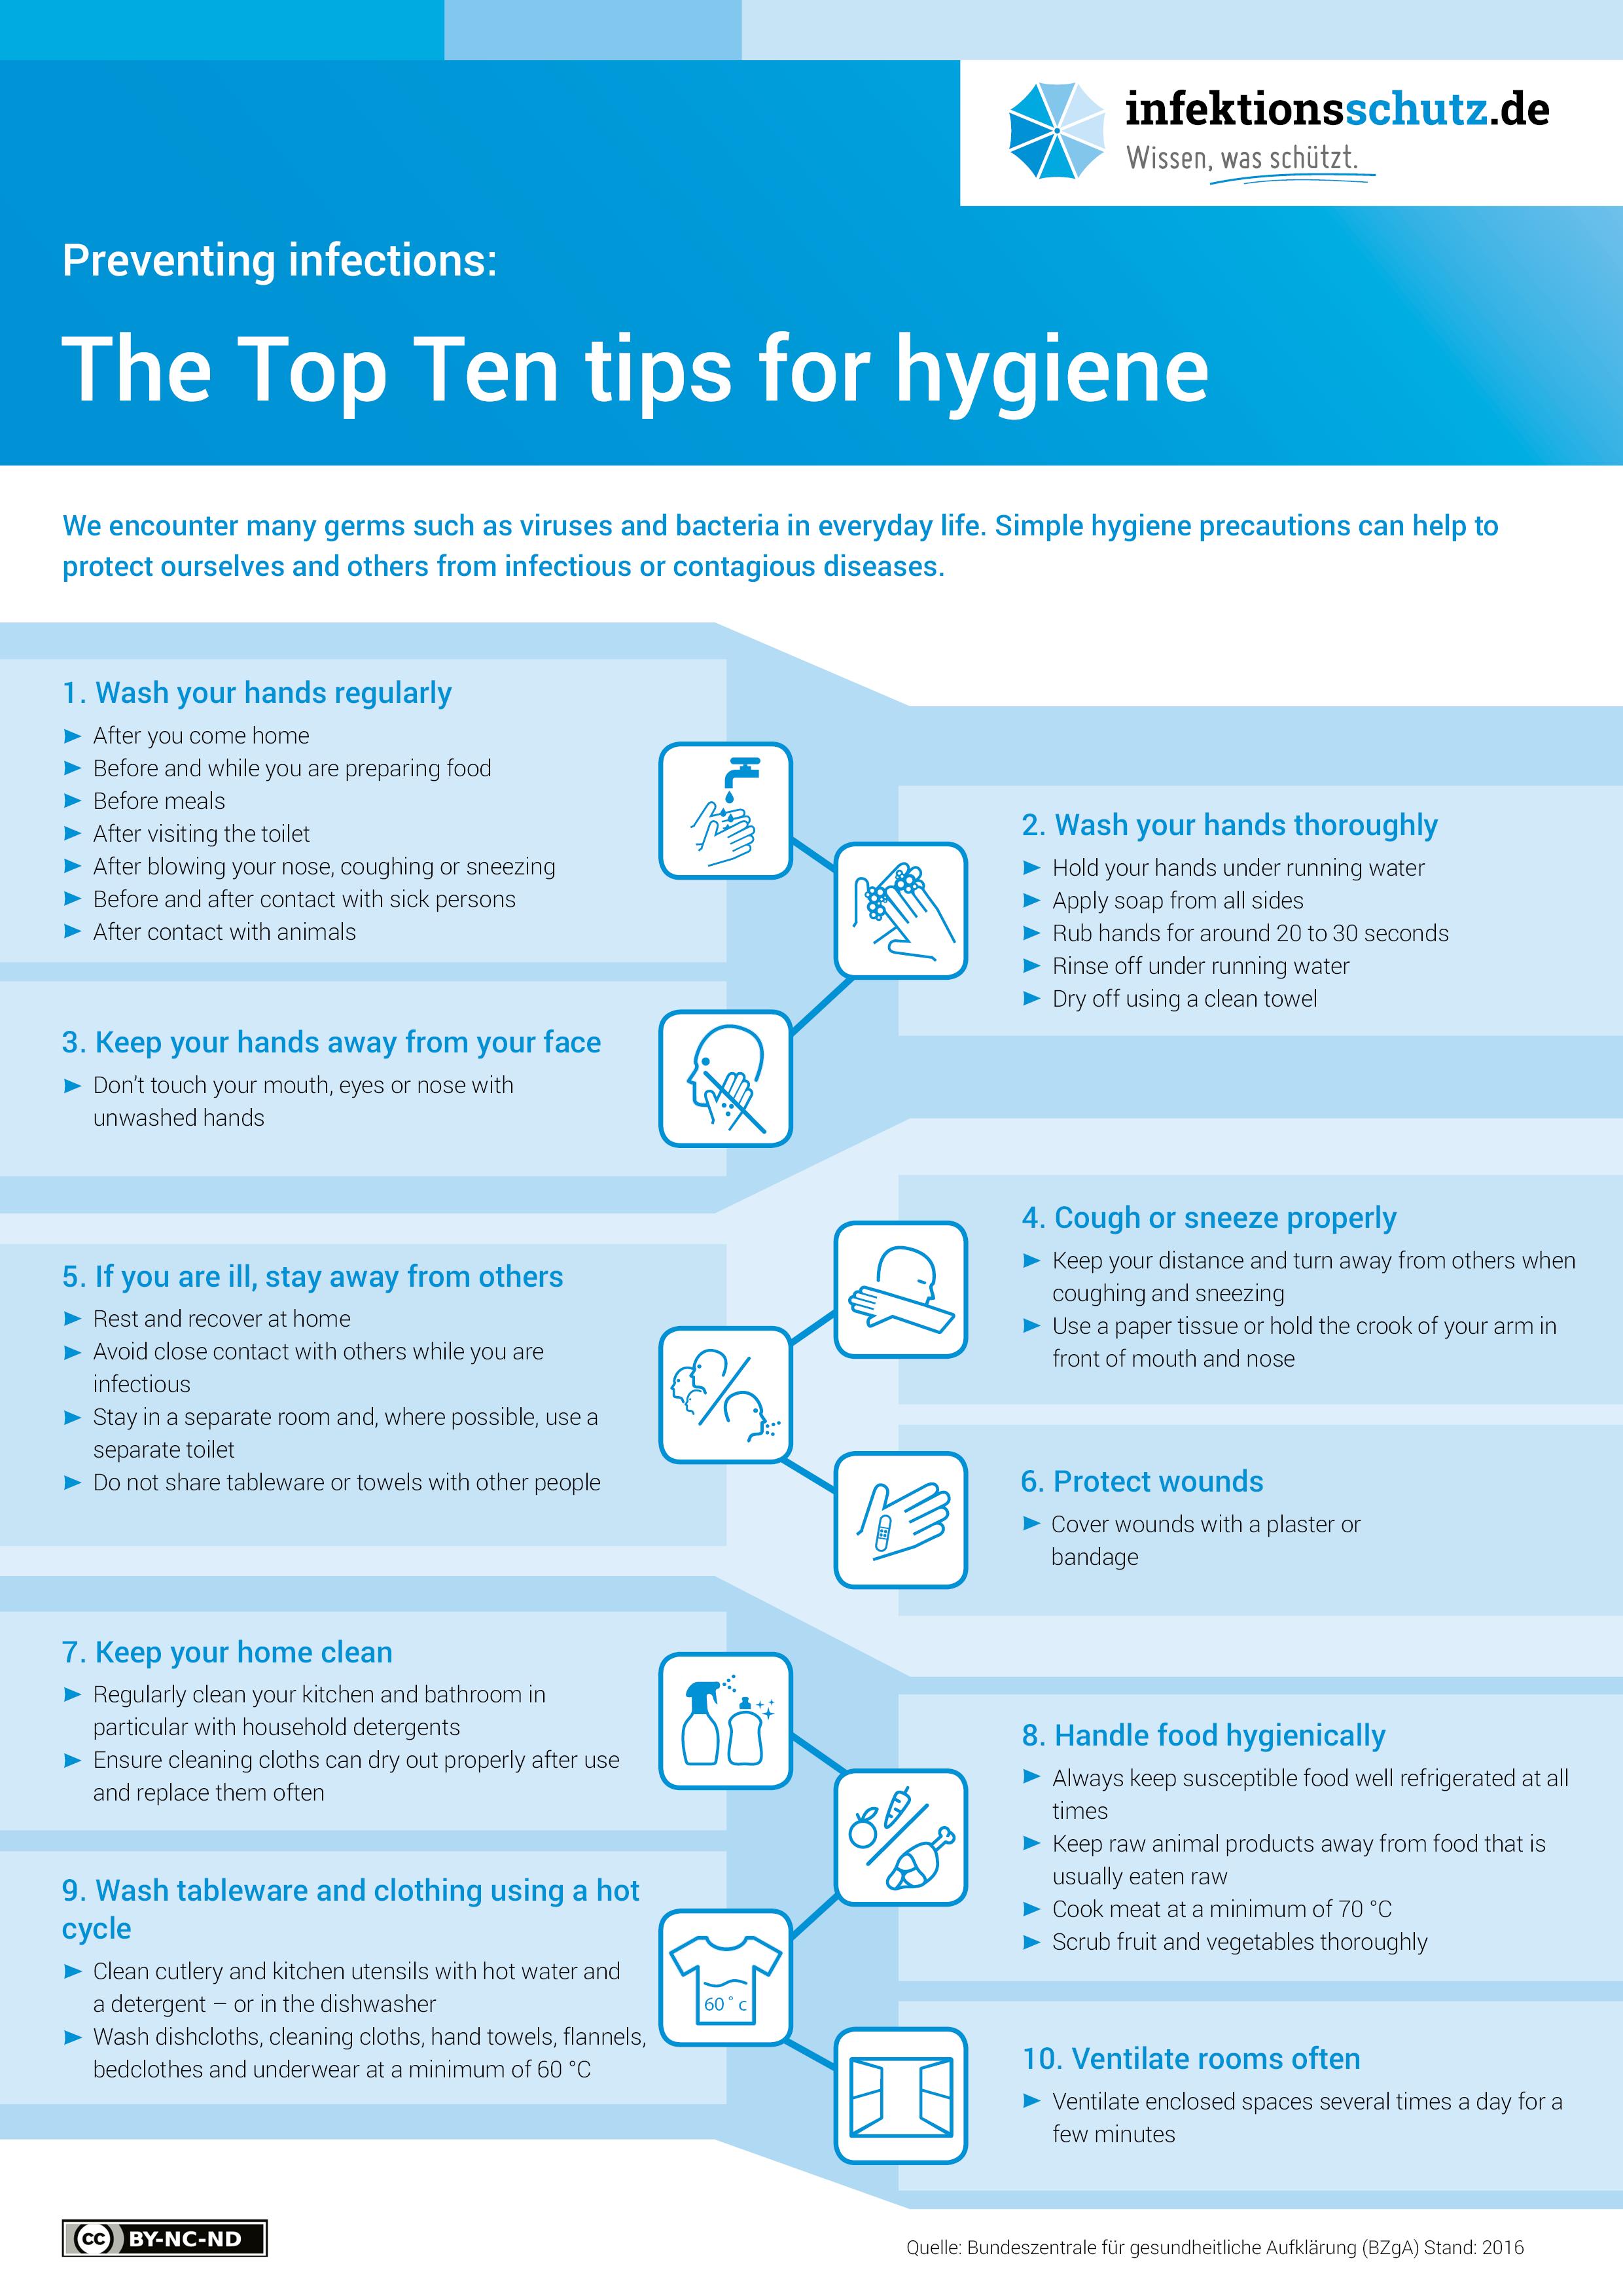 A4_Plakat_10_Hygienetipps_EN_300dpi.png